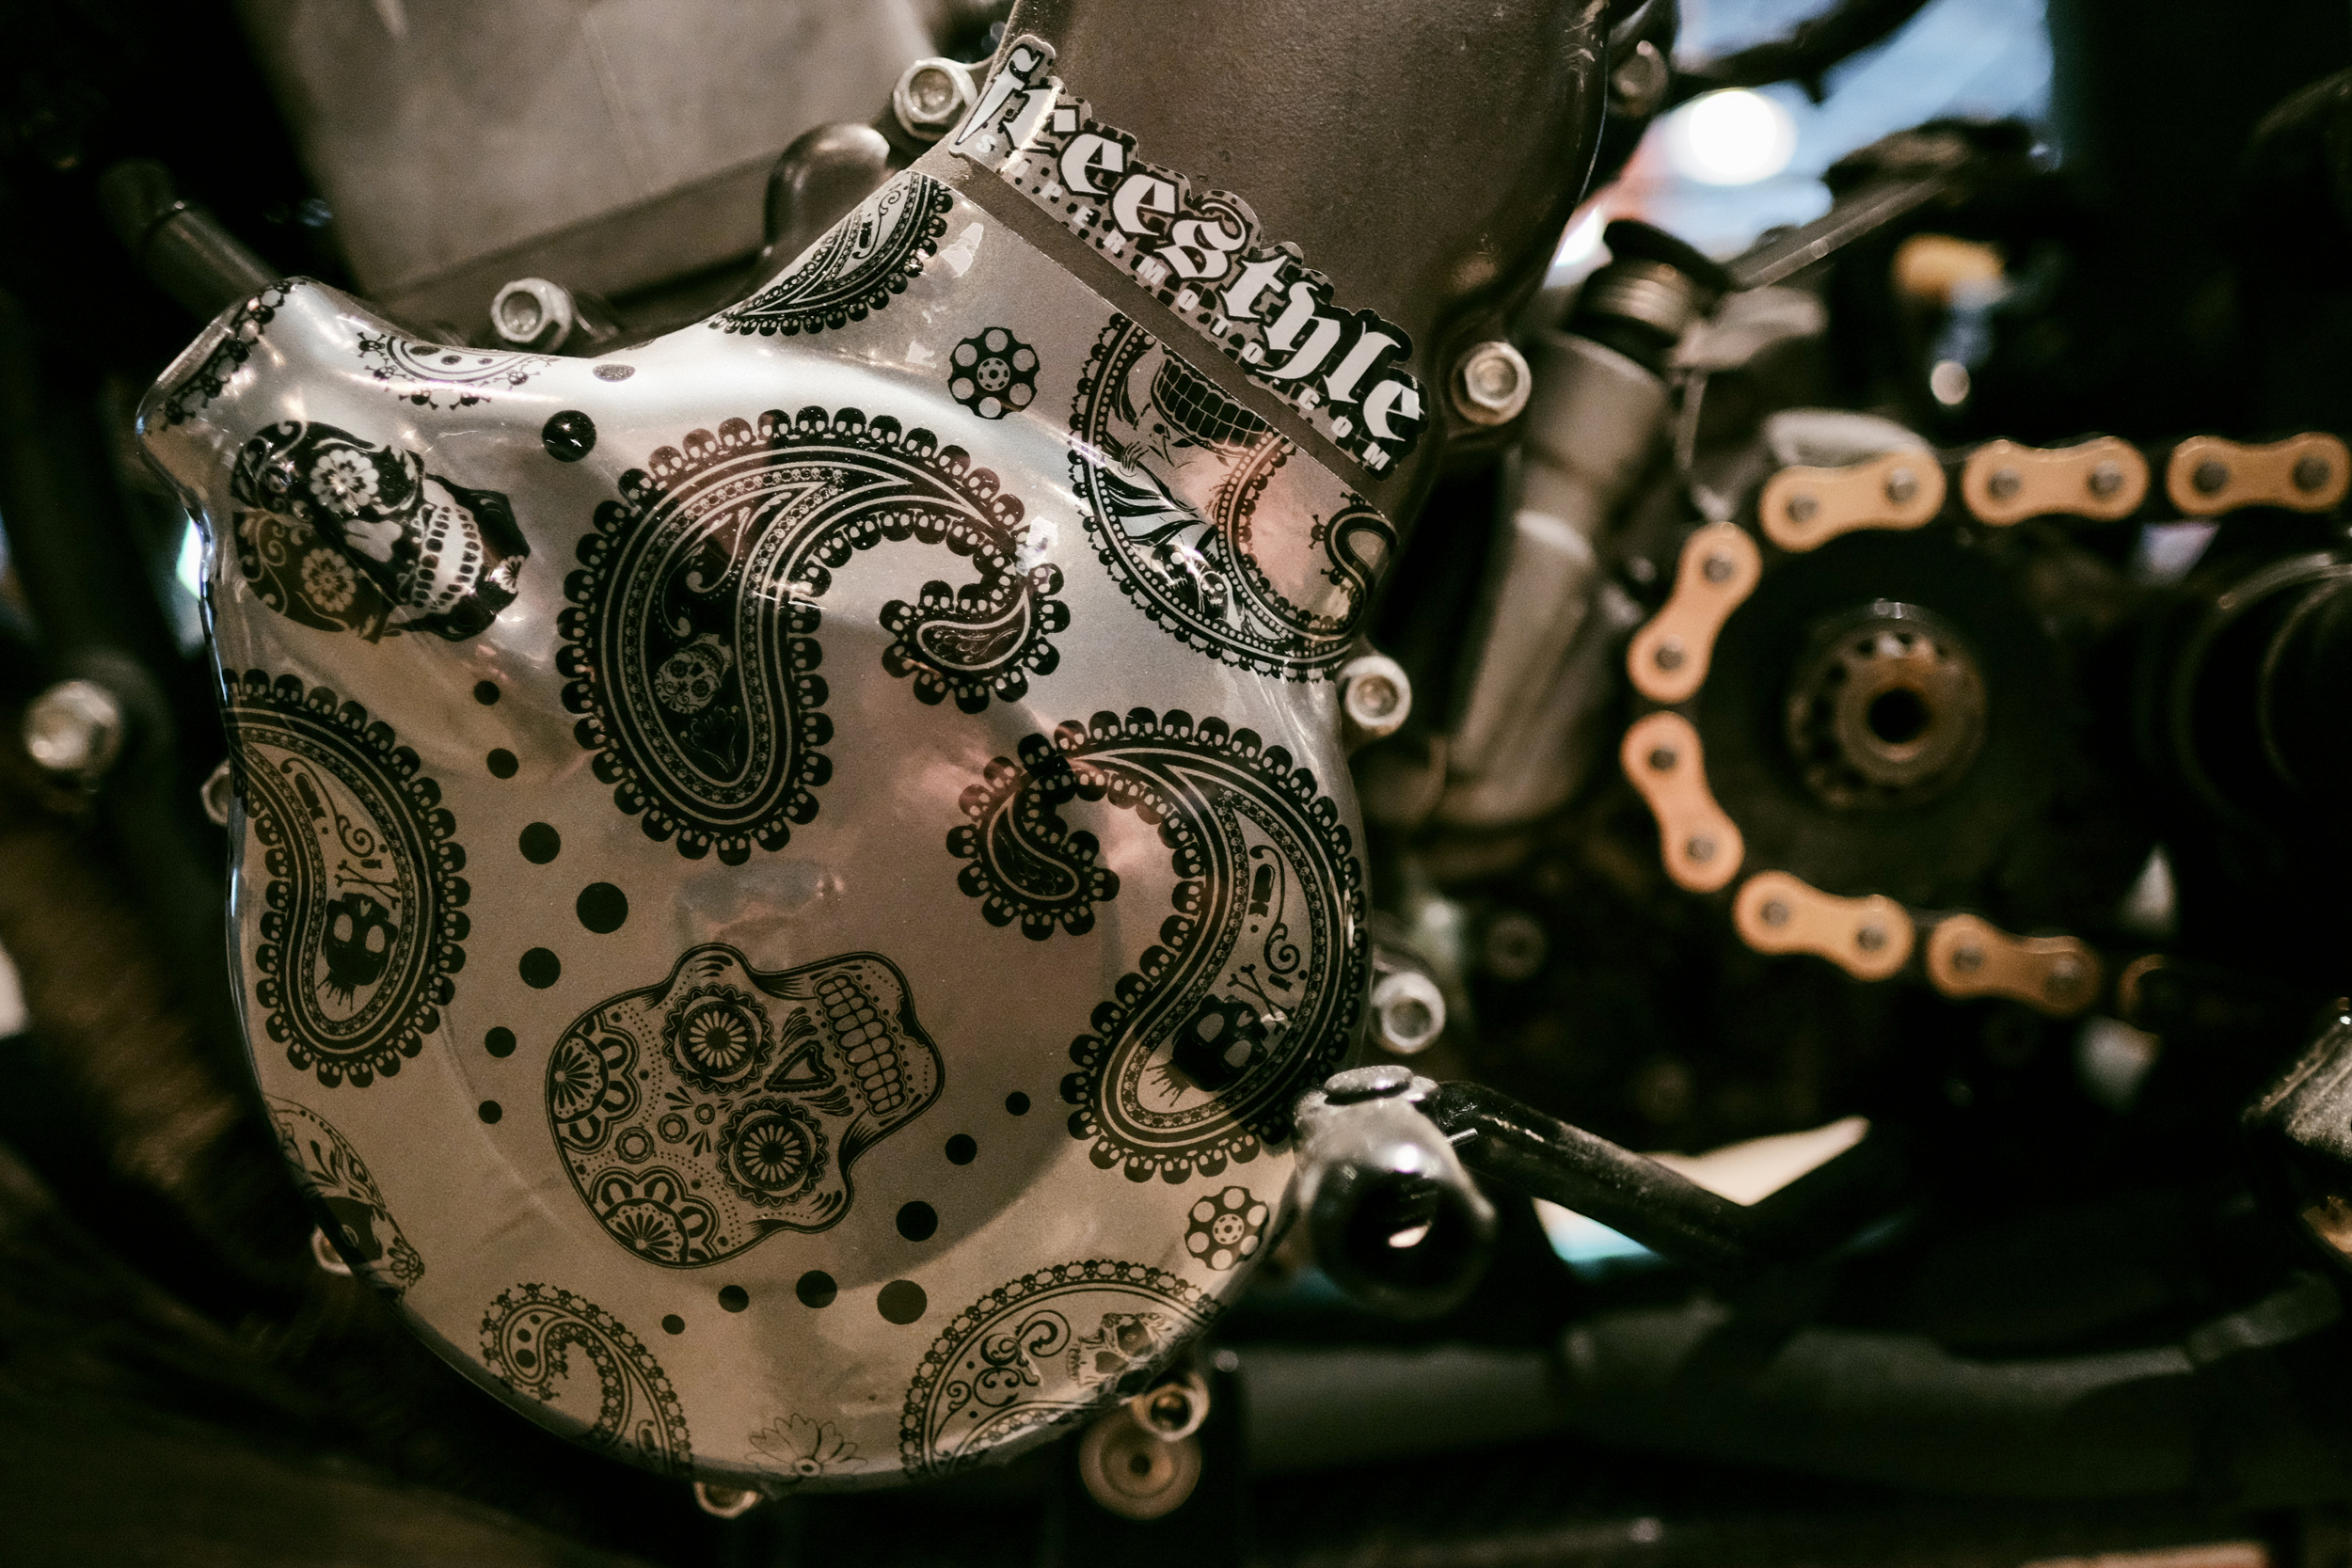 handbuilt-motorcycle-show-2016-8681.jpg